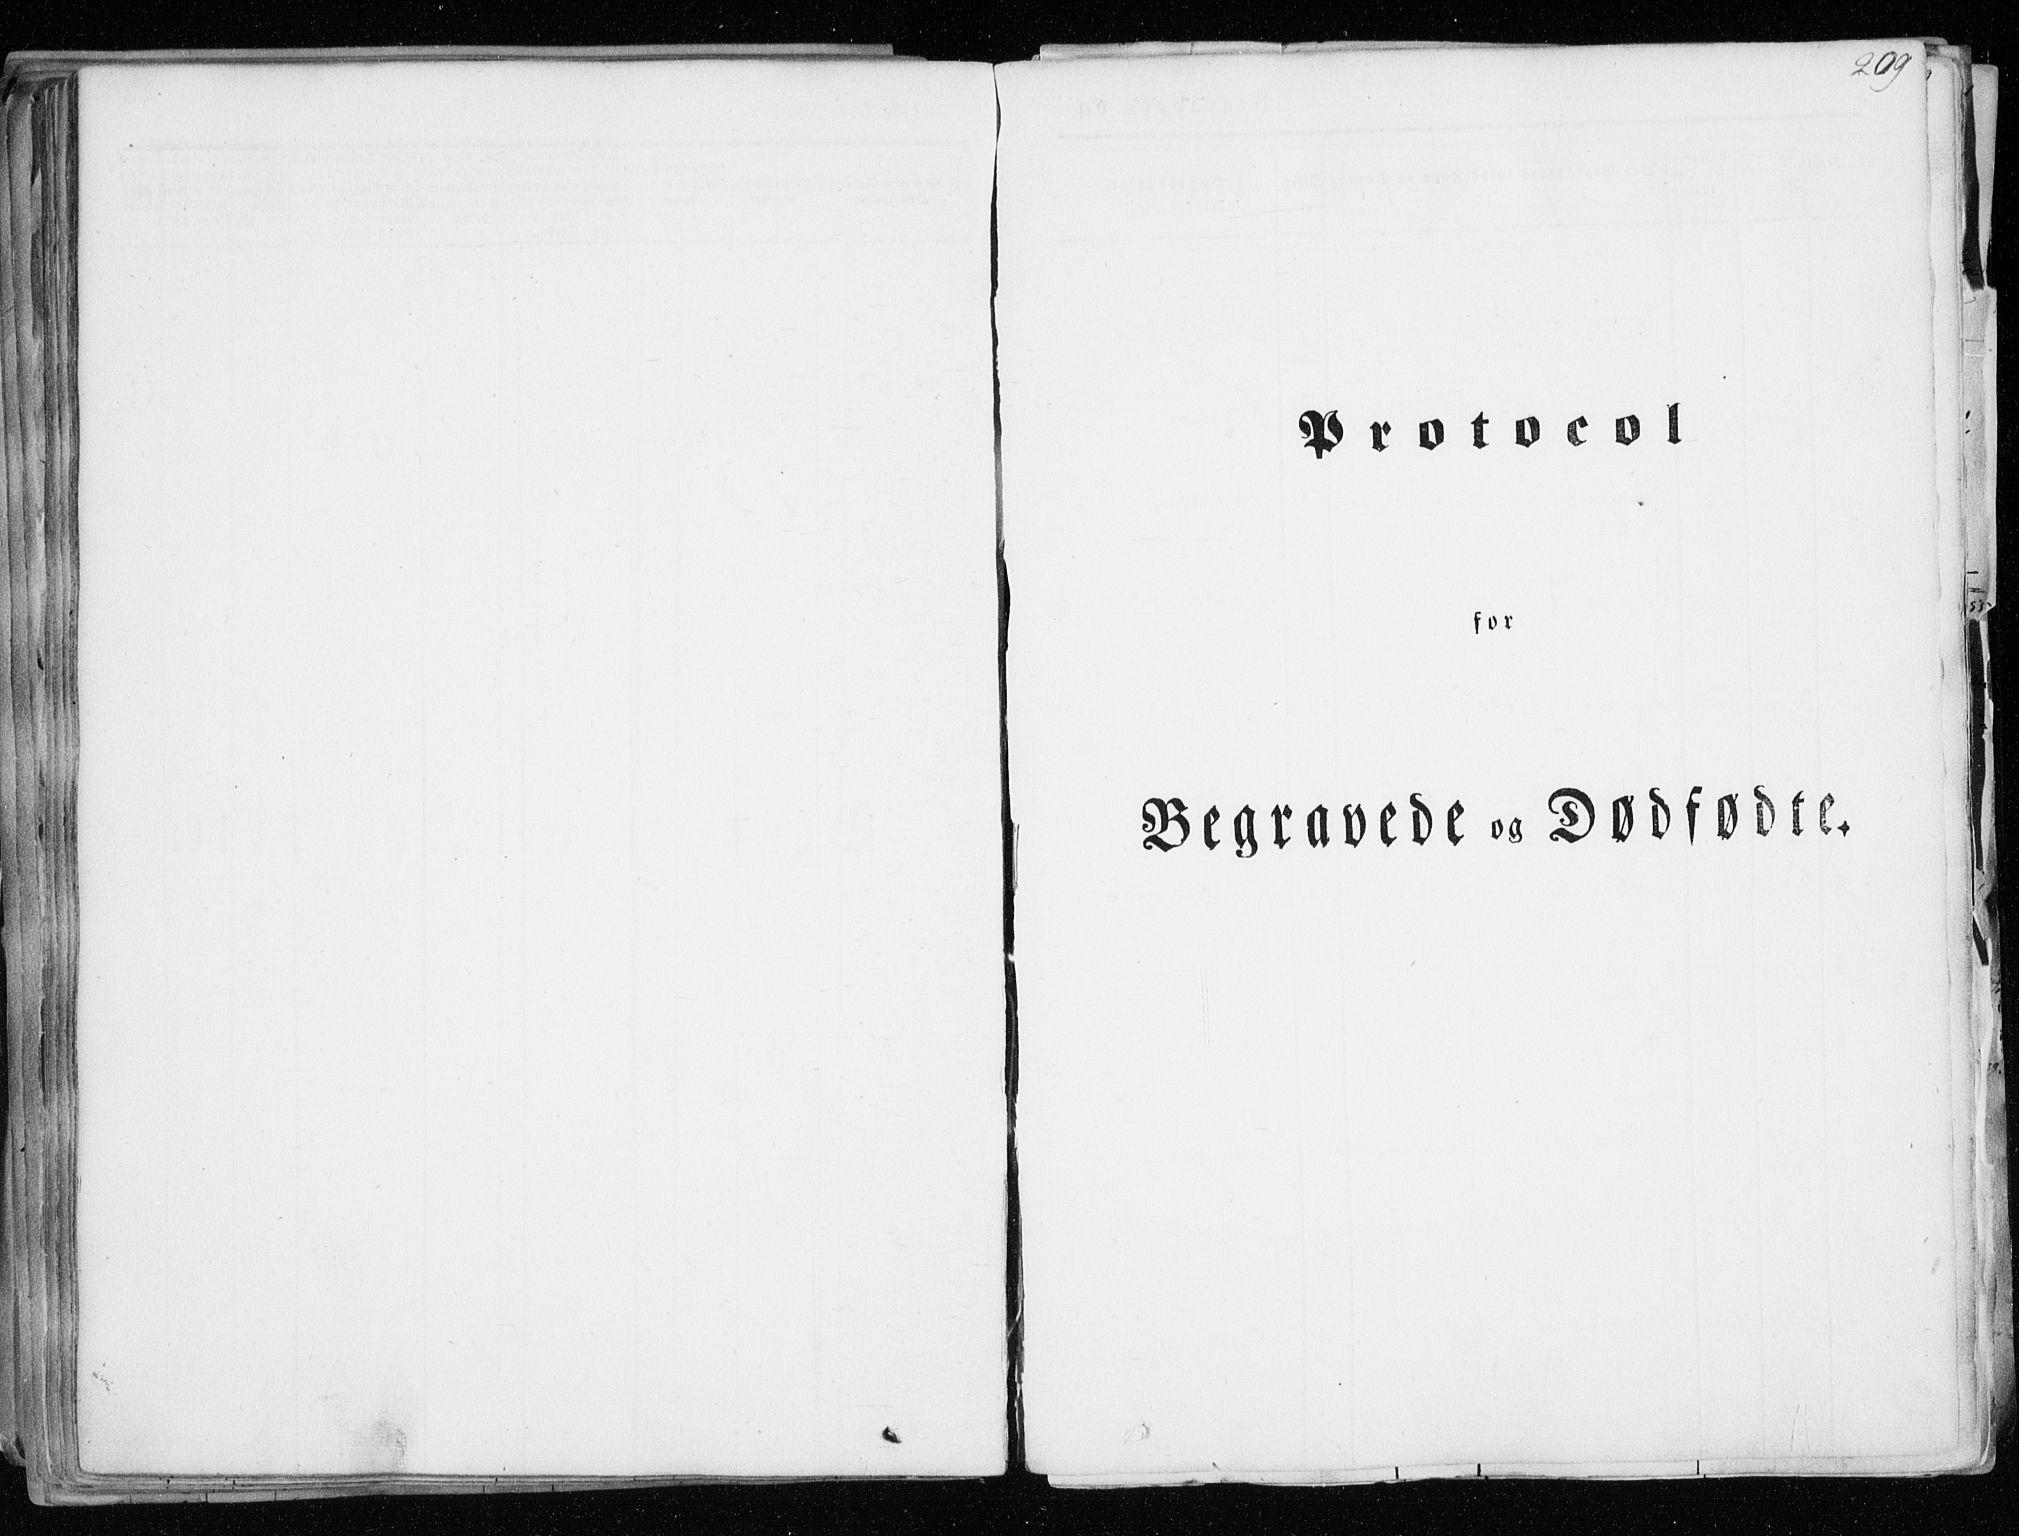 SATØ, Tranøy sokneprestkontor, I/Ia/Iaa/L0006kirke: Ministerialbok nr. 6, 1844-1855, s. 209